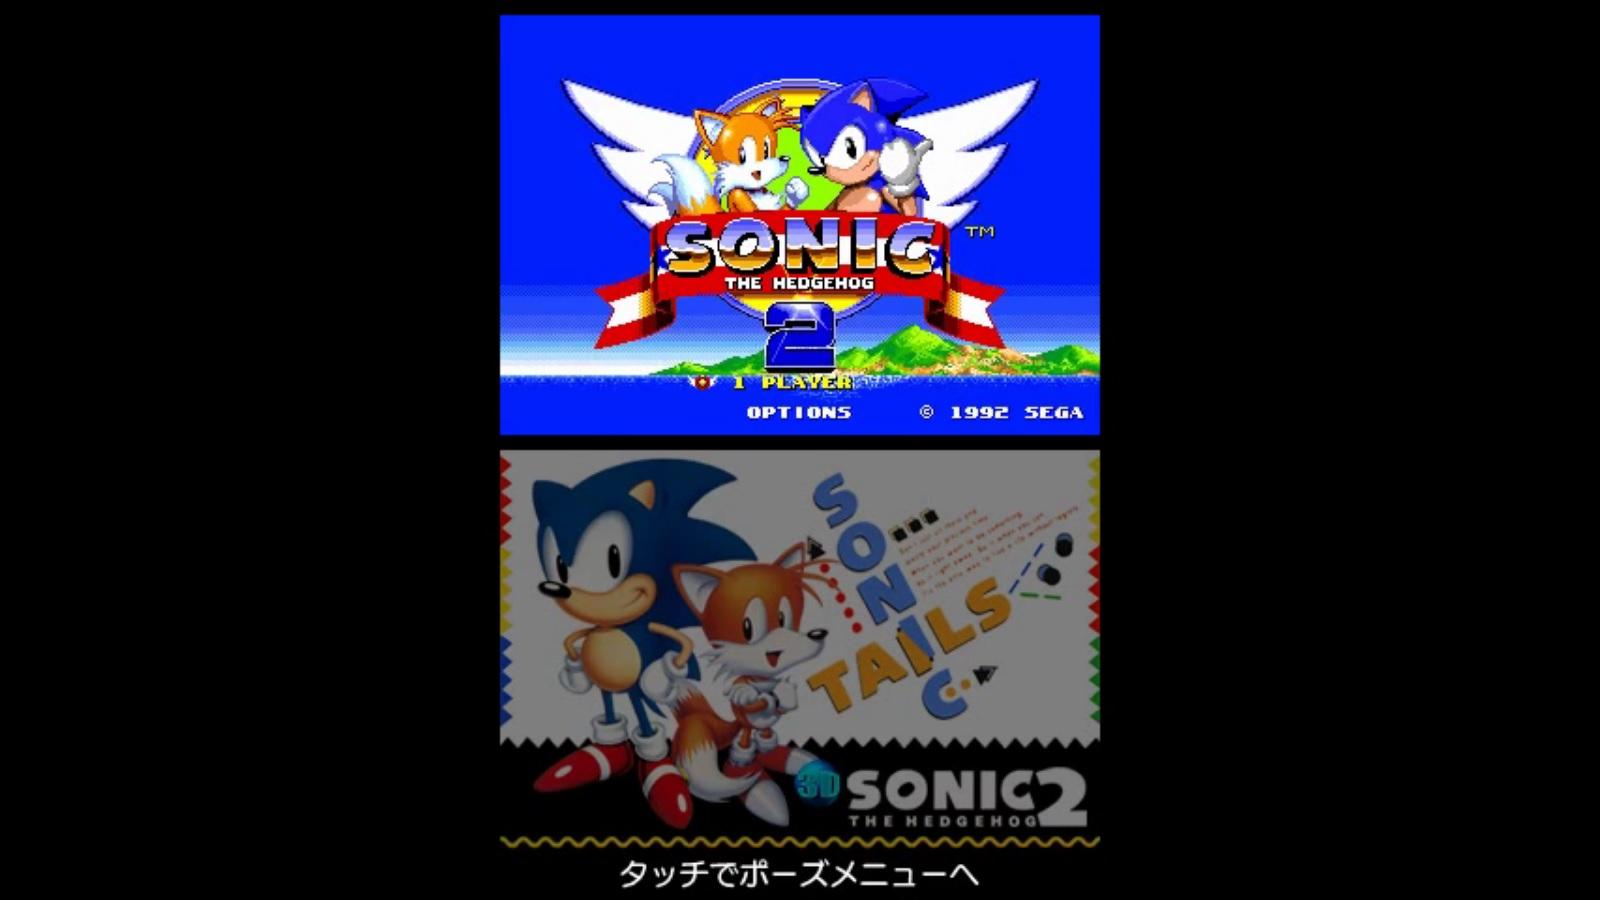 3d sonic the hedgehog 2 has an unlockable super sonic mode